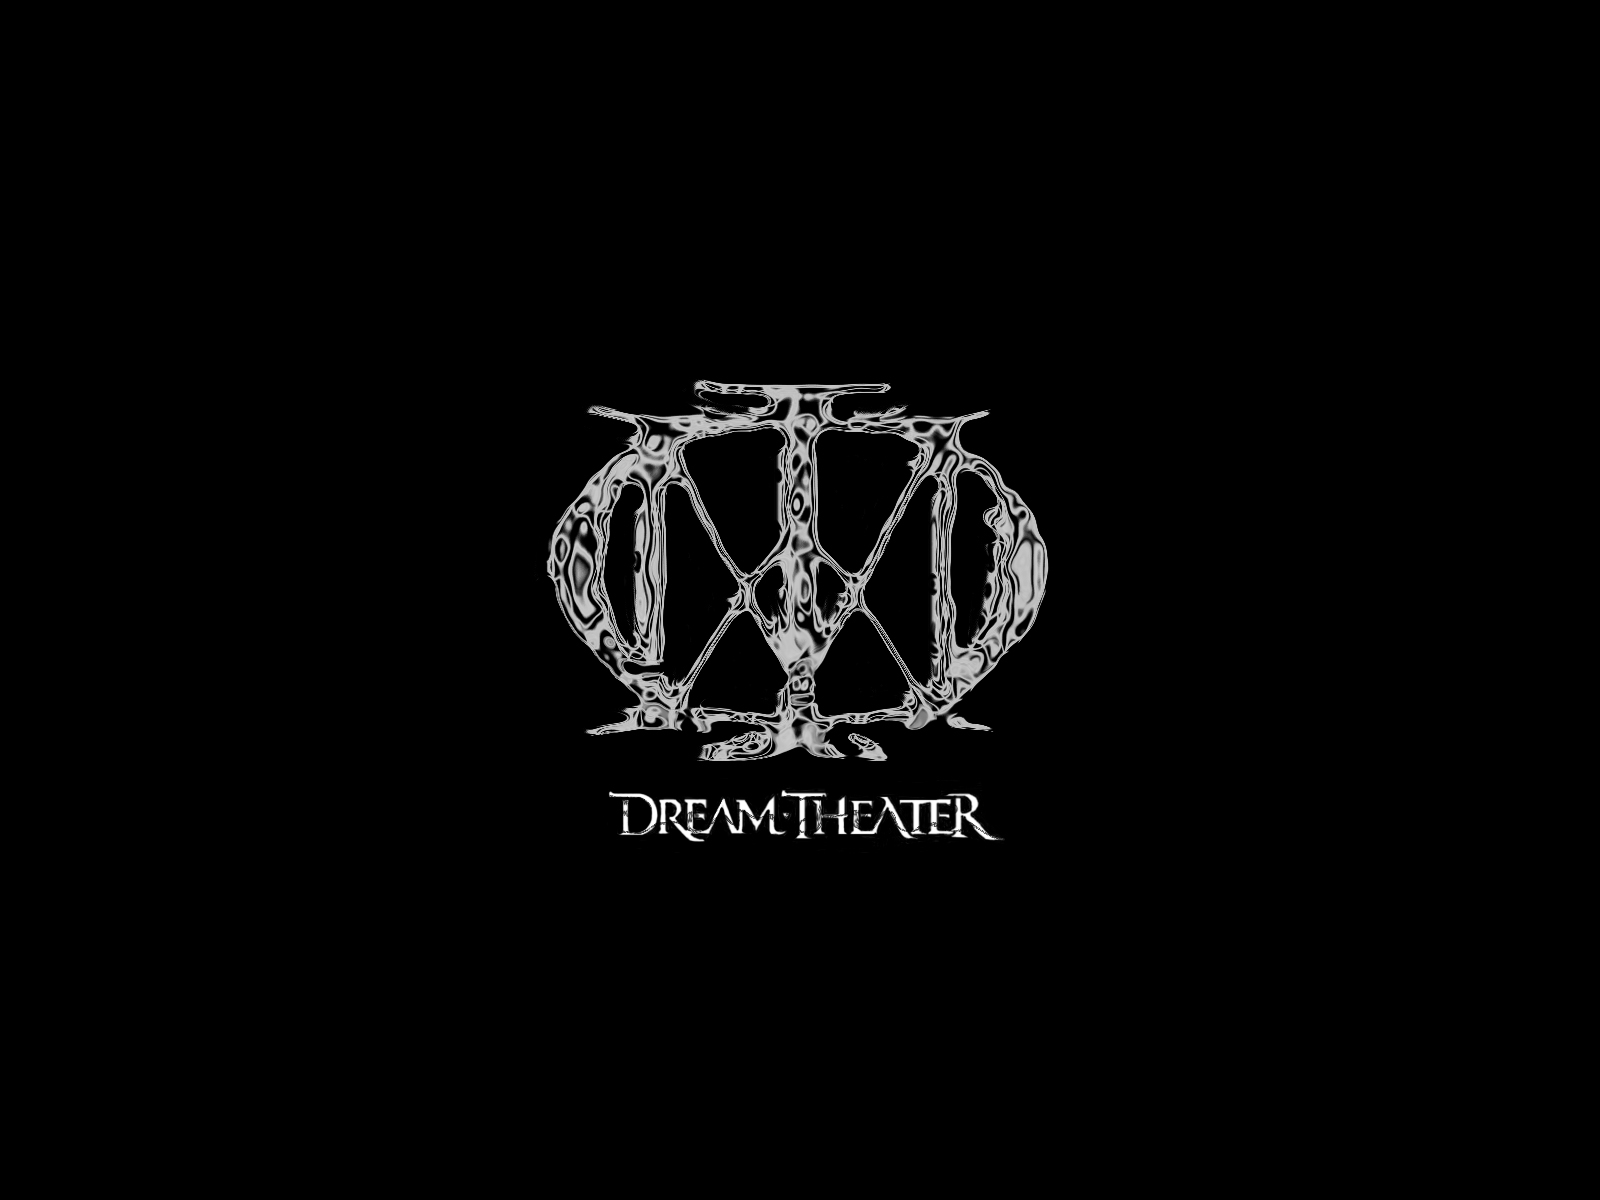 Dream Theater Wallpaper by eibbor on DeviantArt